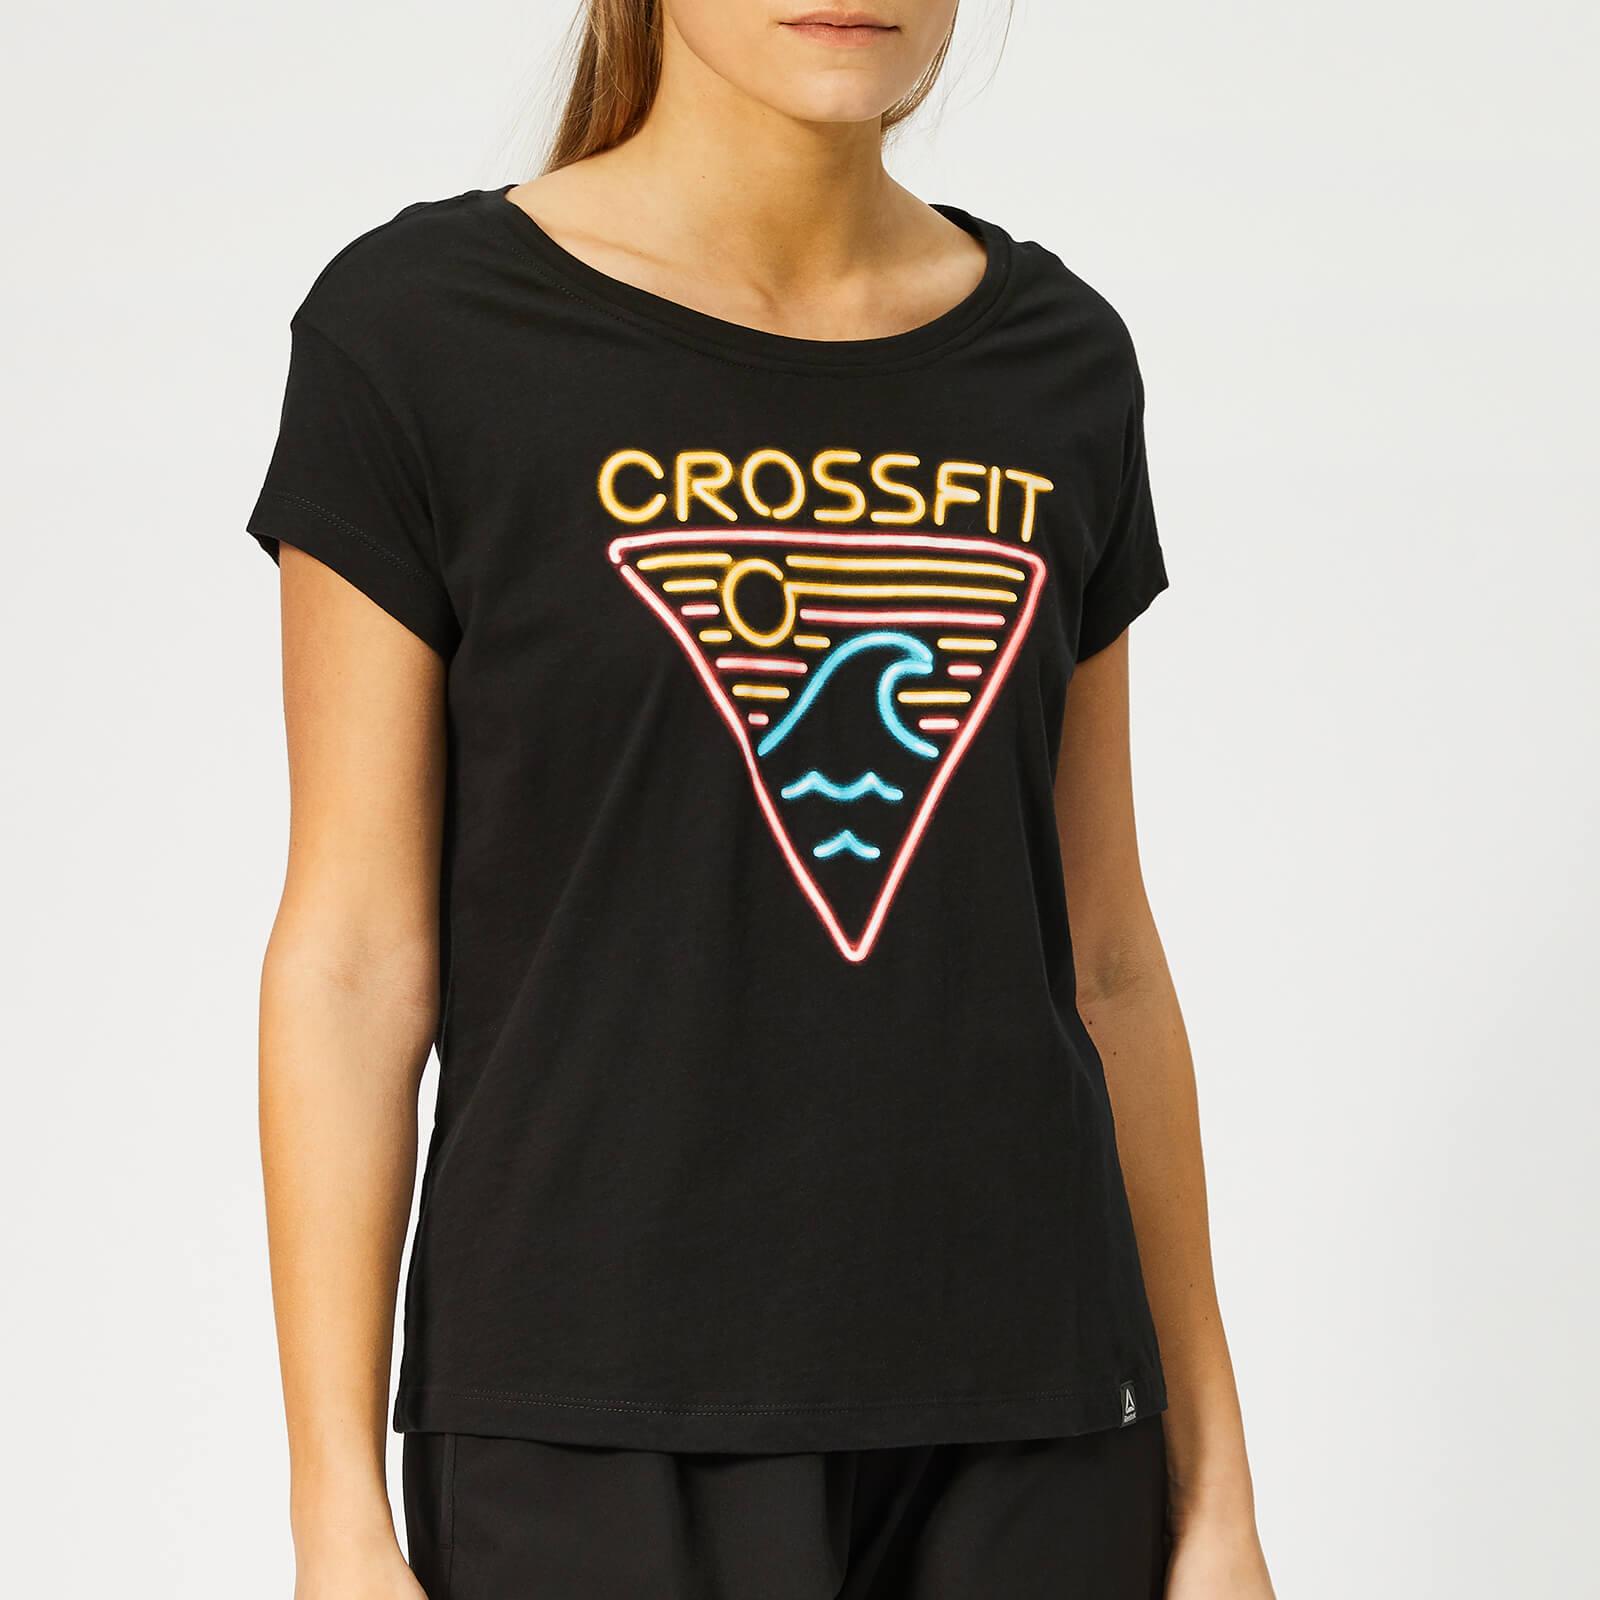 Reebok Women's Crossfit Neon Retro Easy Short Sleeve T-Shirt - Black - L - Black